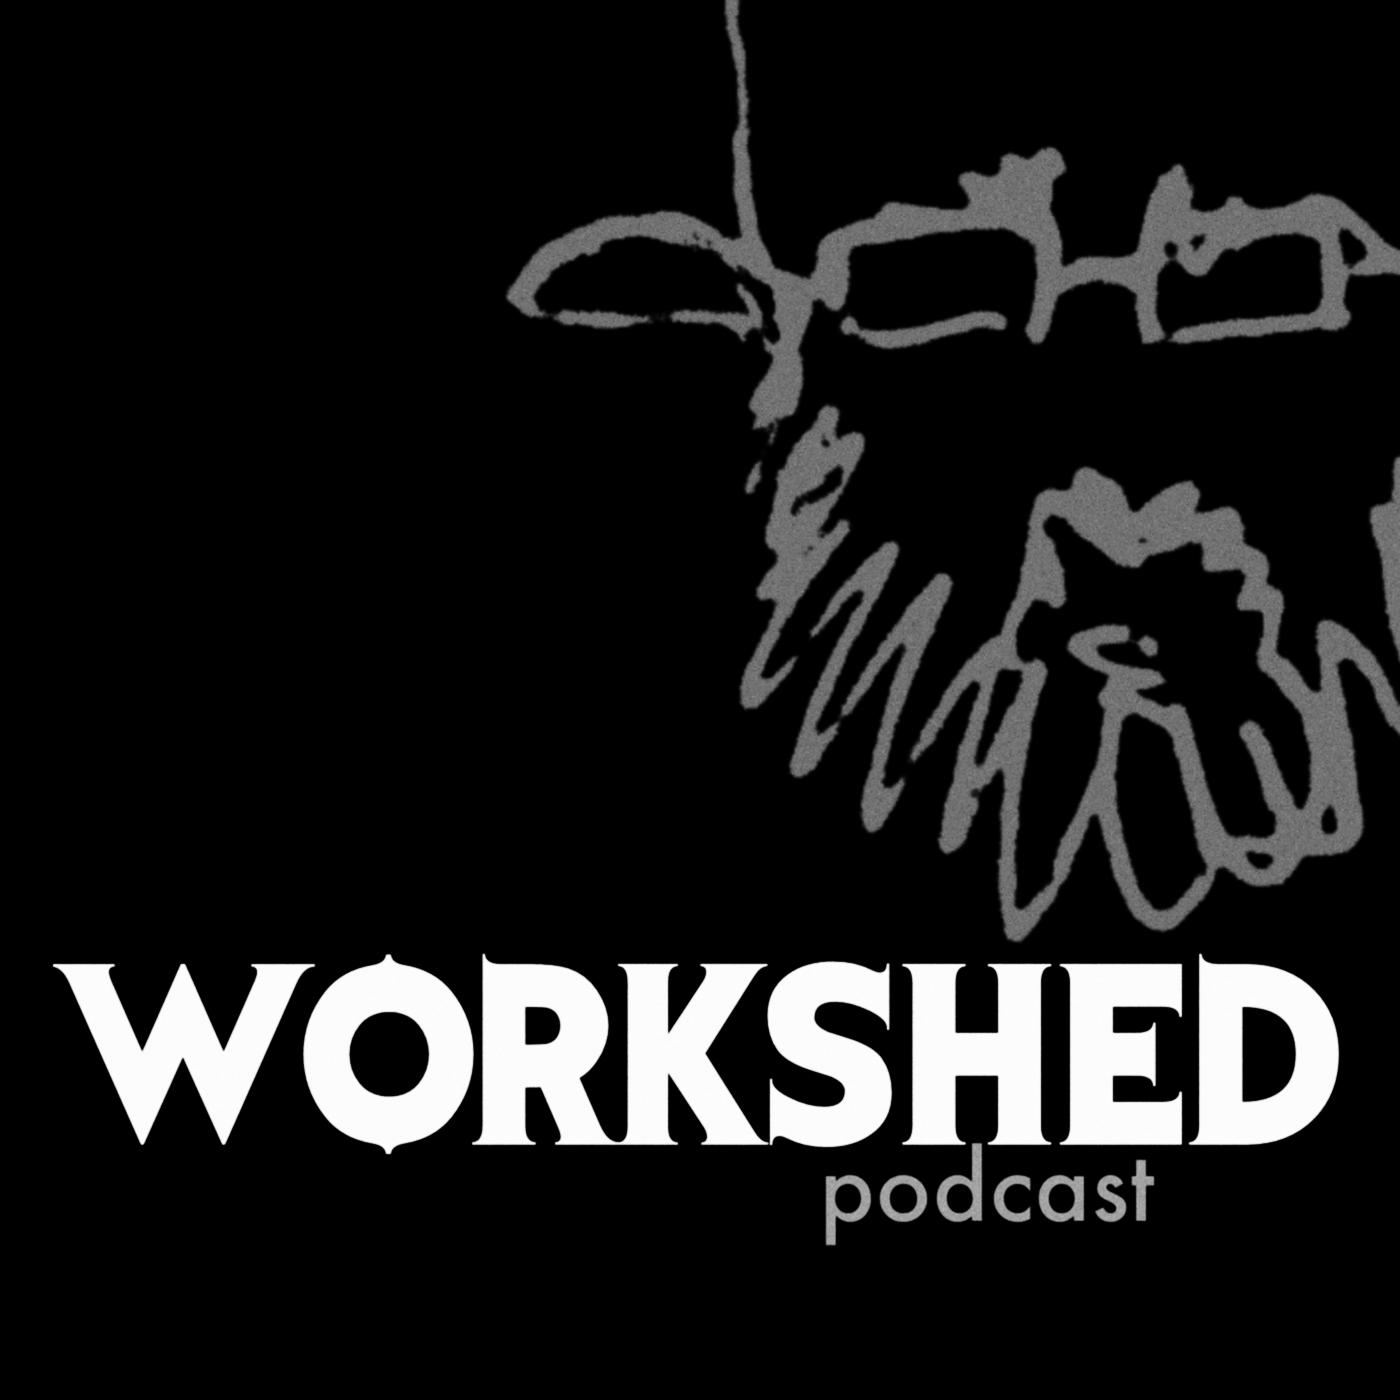 Workshed Podcast show art